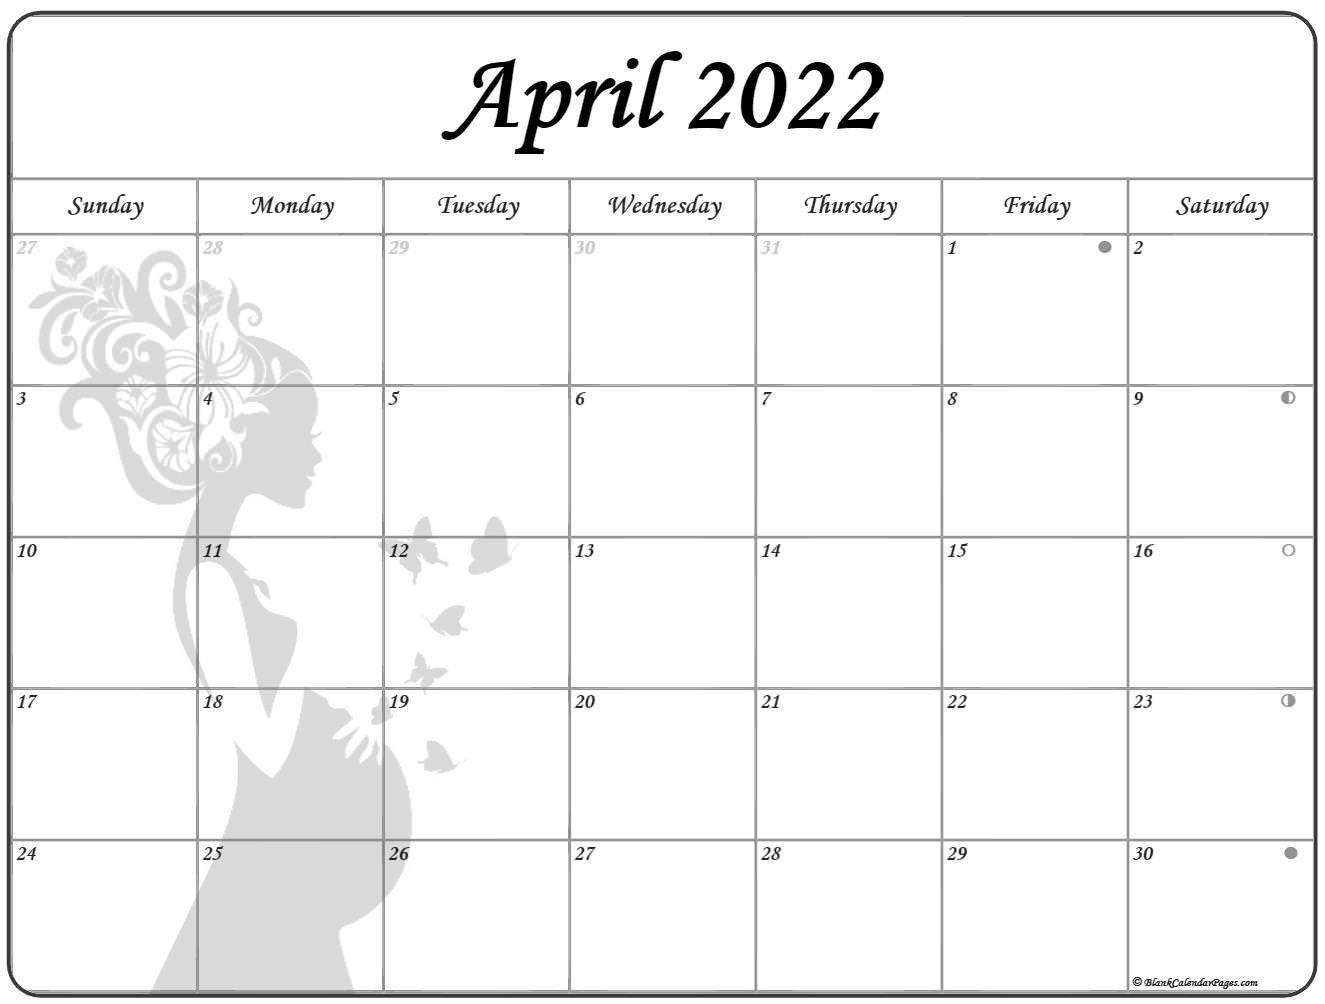 April 2022 Pregnancy Calendar   Fertility Calendar pertaining to April May Calendar 2022 Printable